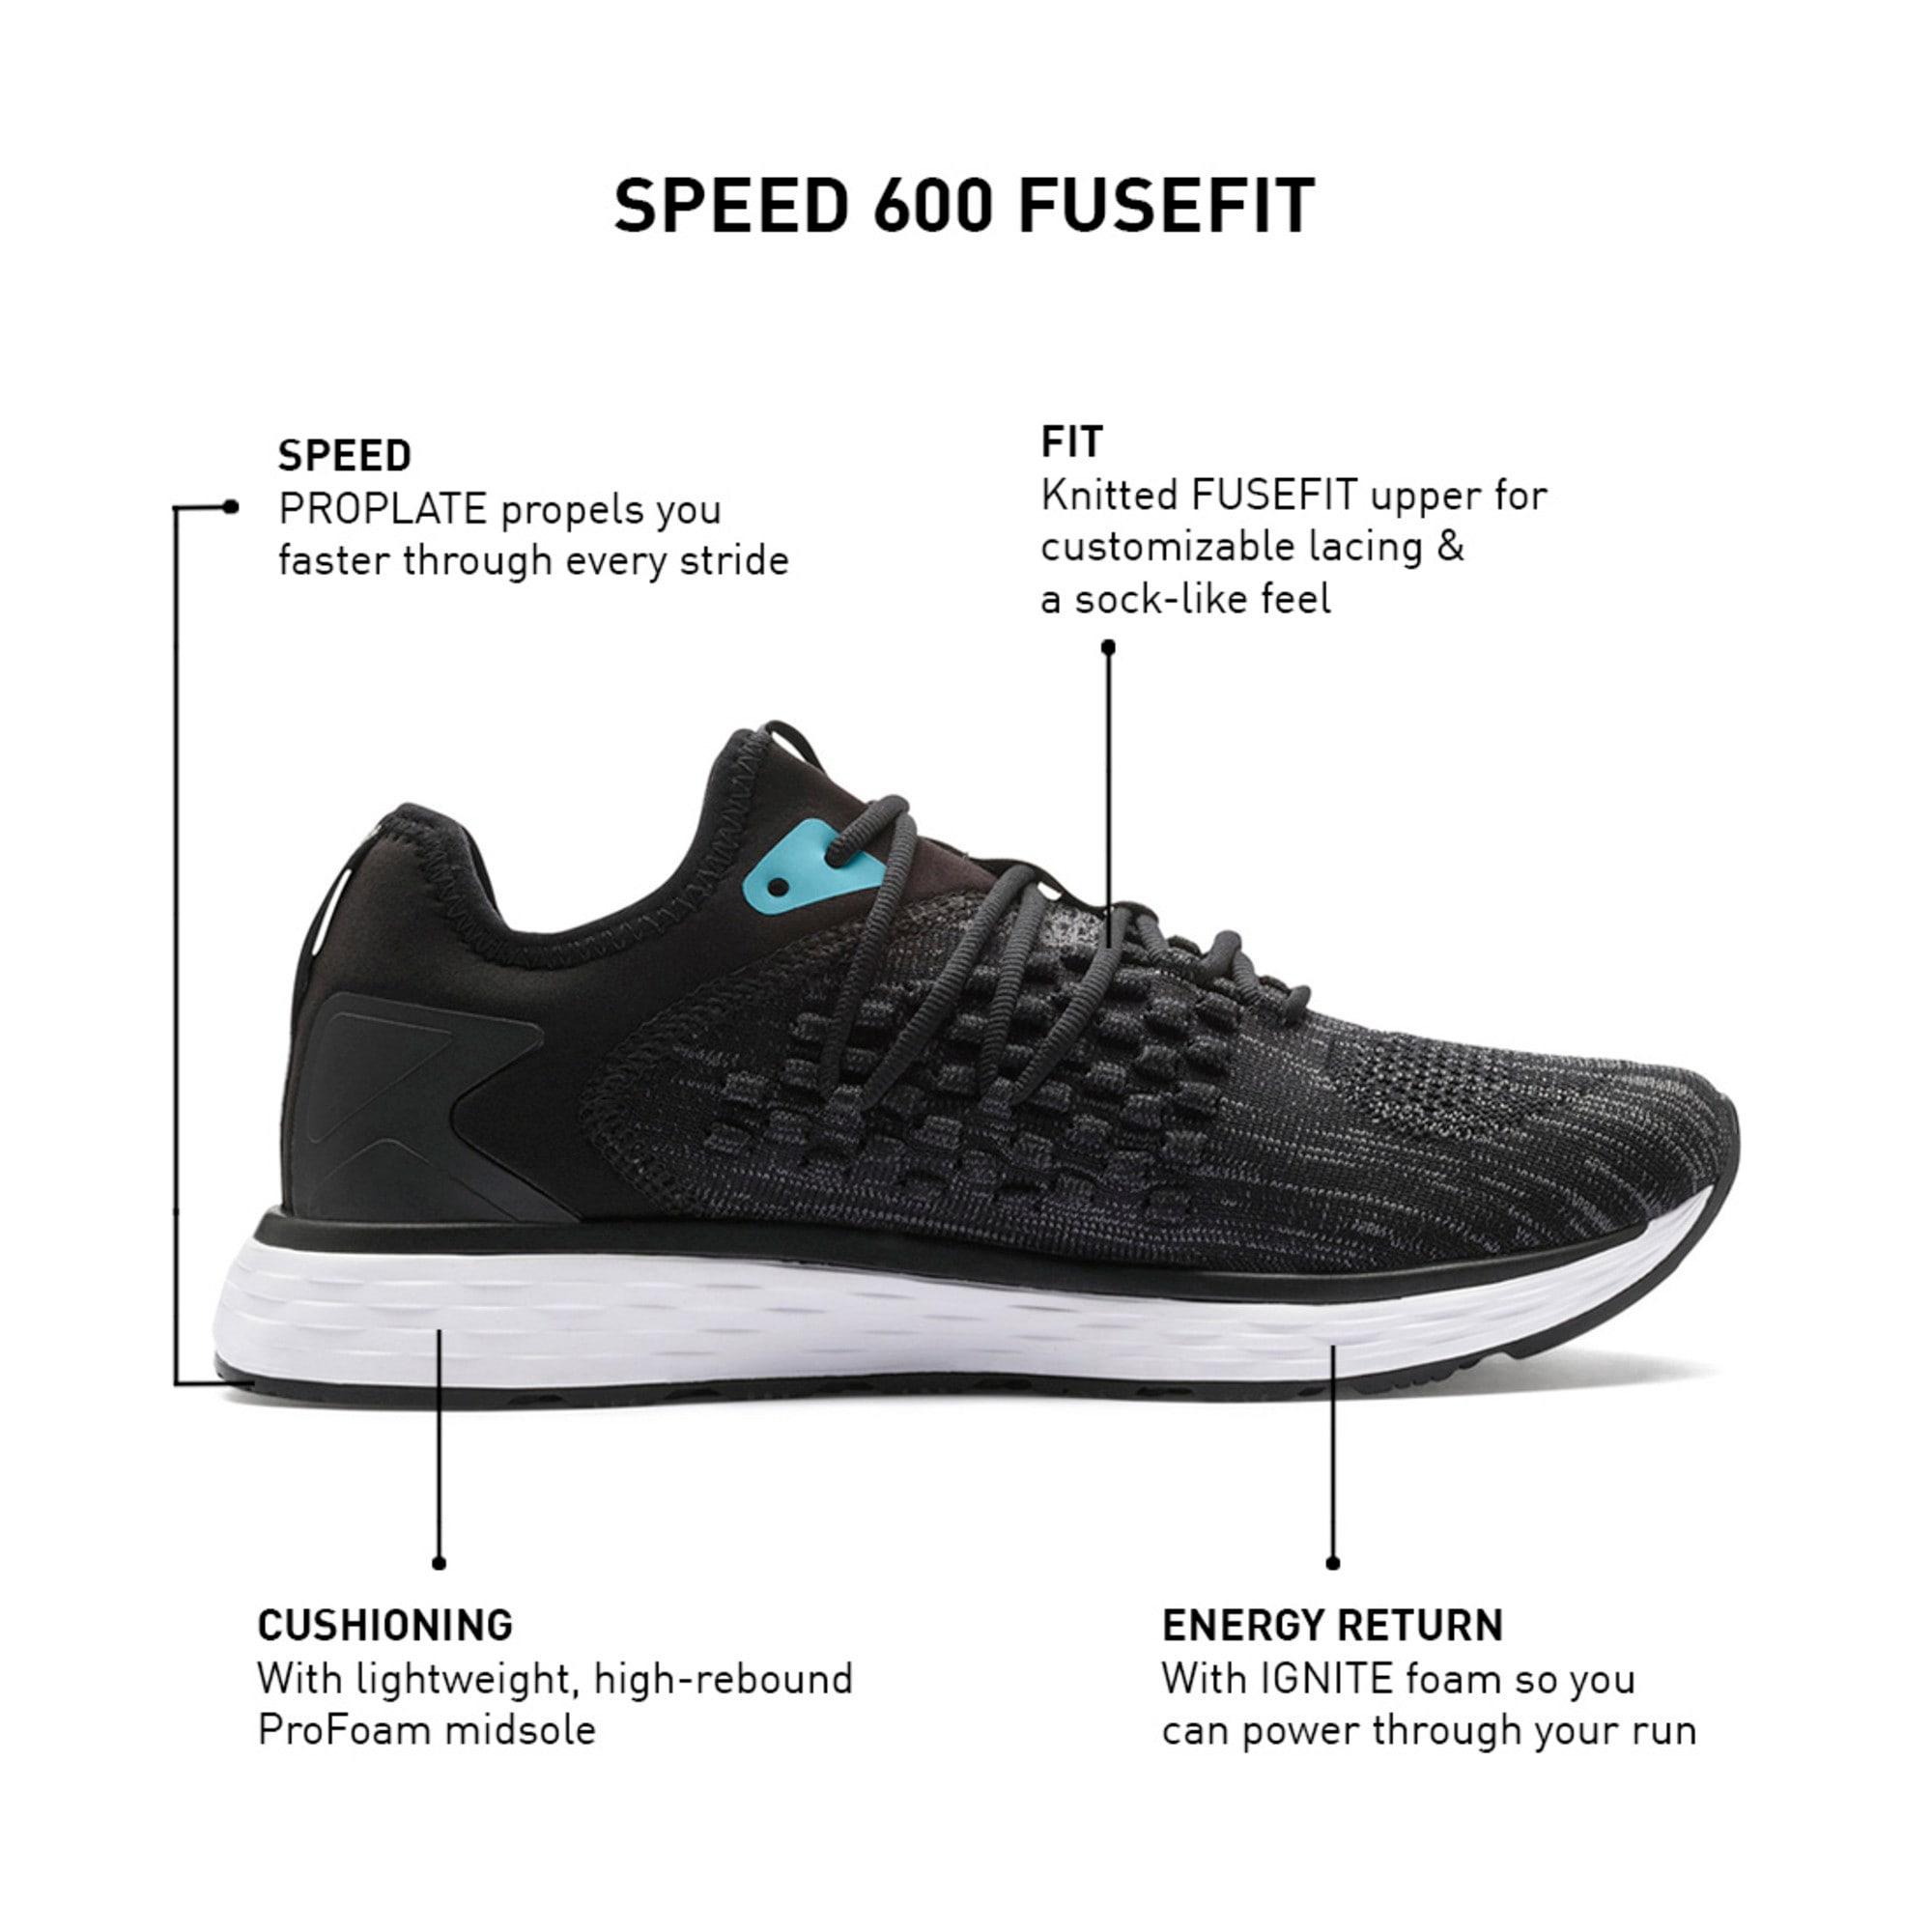 Thumbnail 9 of SPEED FUSEFIT Women's Running Shoes, Puma Black-Milky Blue, medium-IND